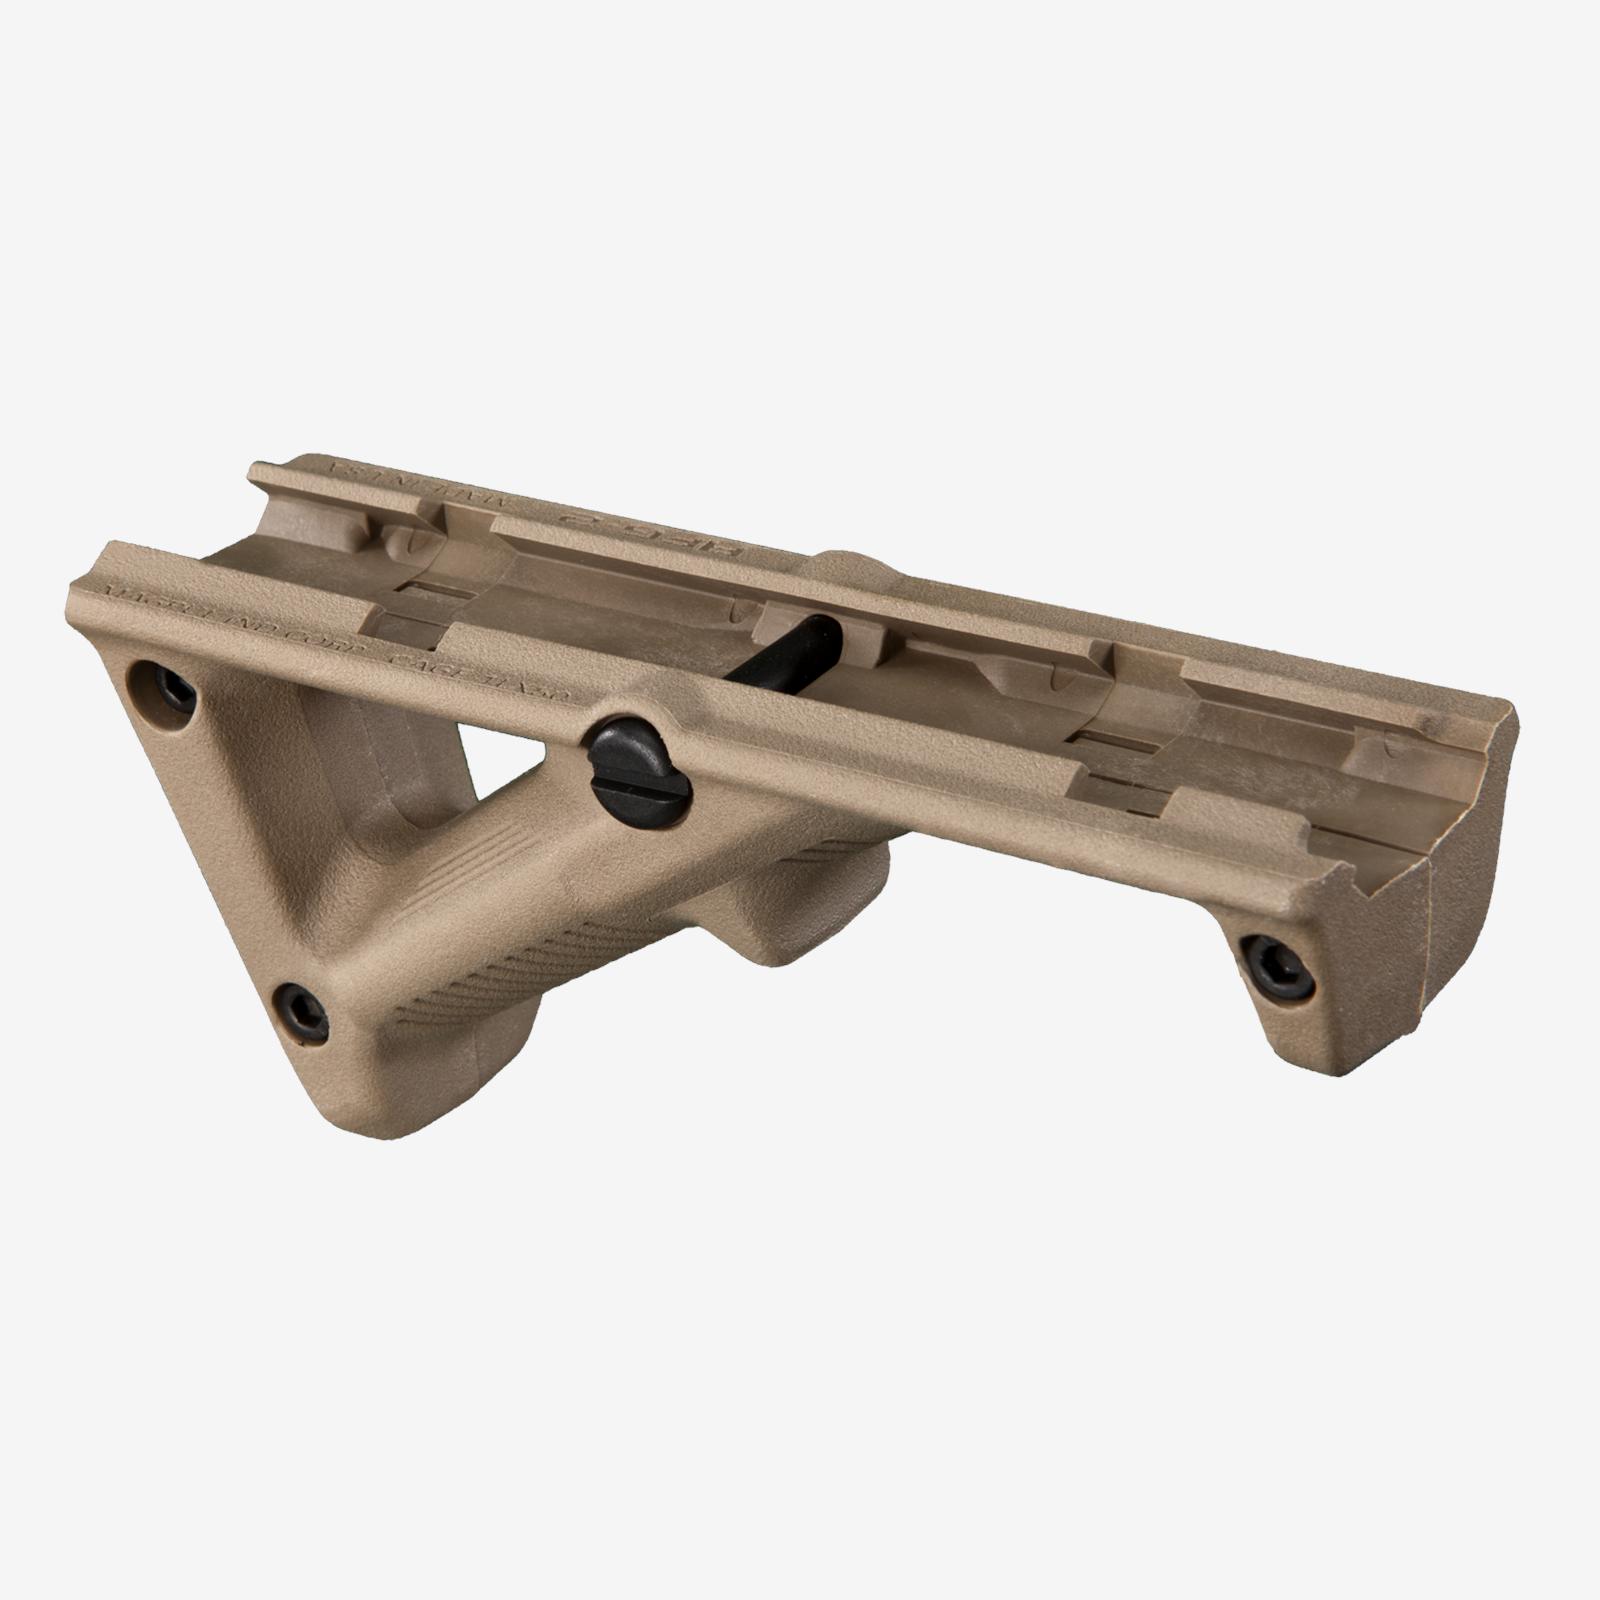 Рукоятка на цевье горизонтальная MAGPUL AFG-2®-AngledForeGrip